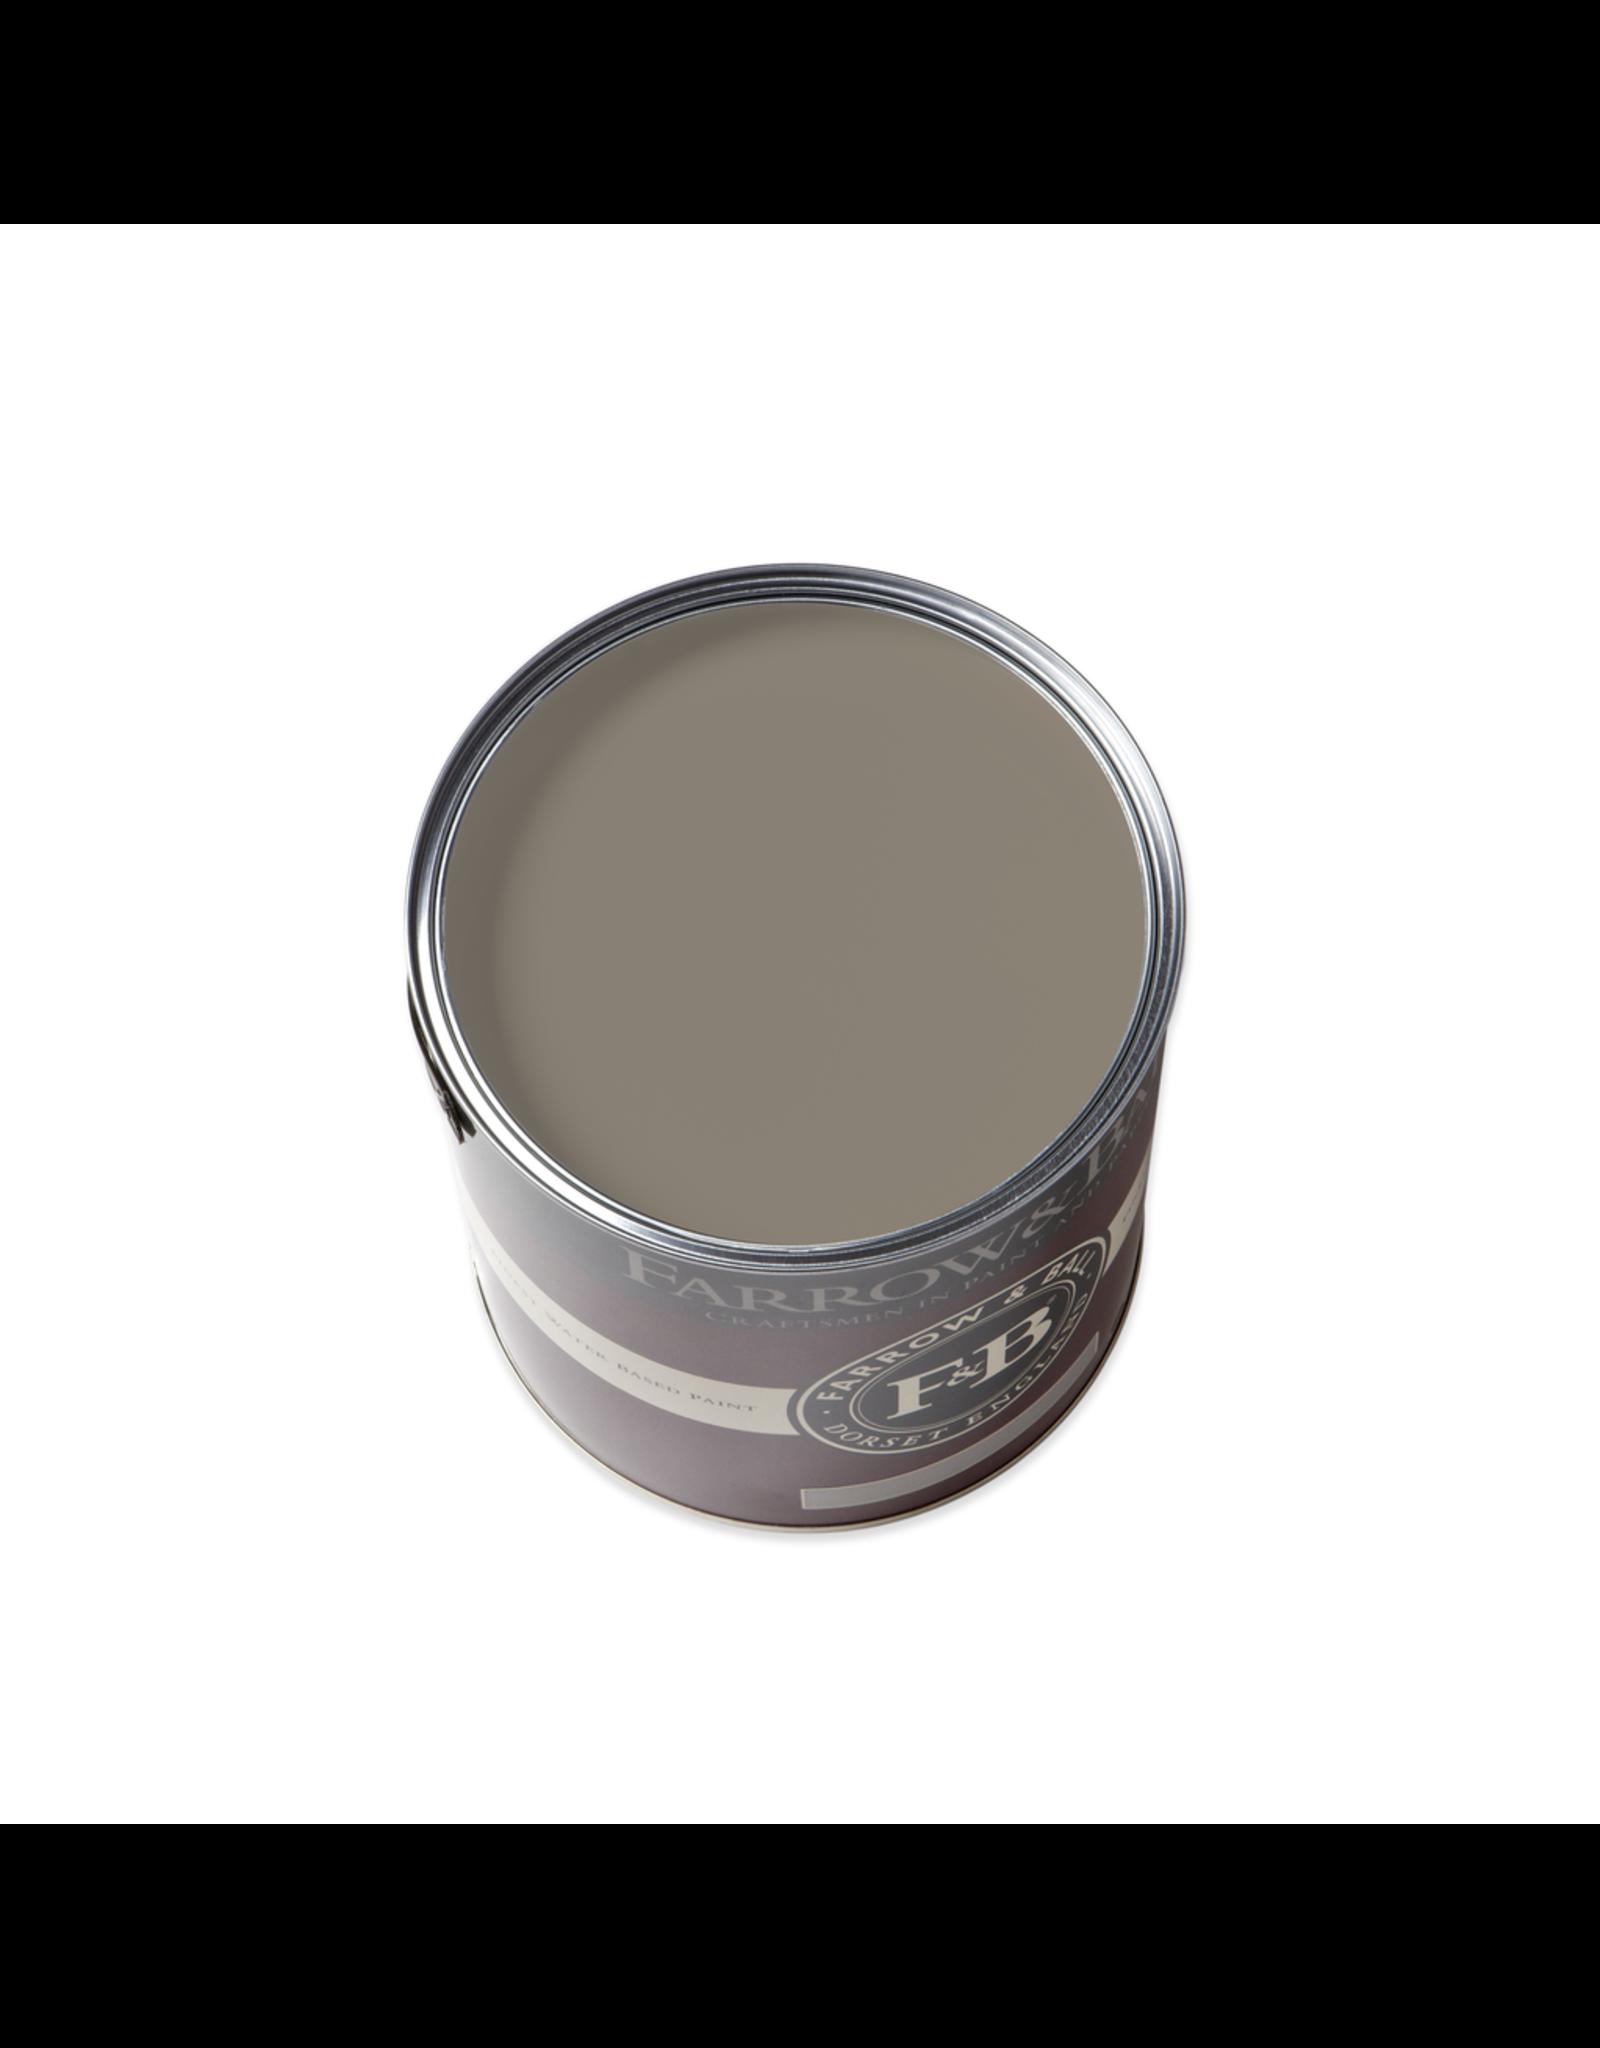 Farrow and Ball Gallon Modern Emulsion Mouse's Back No. 40